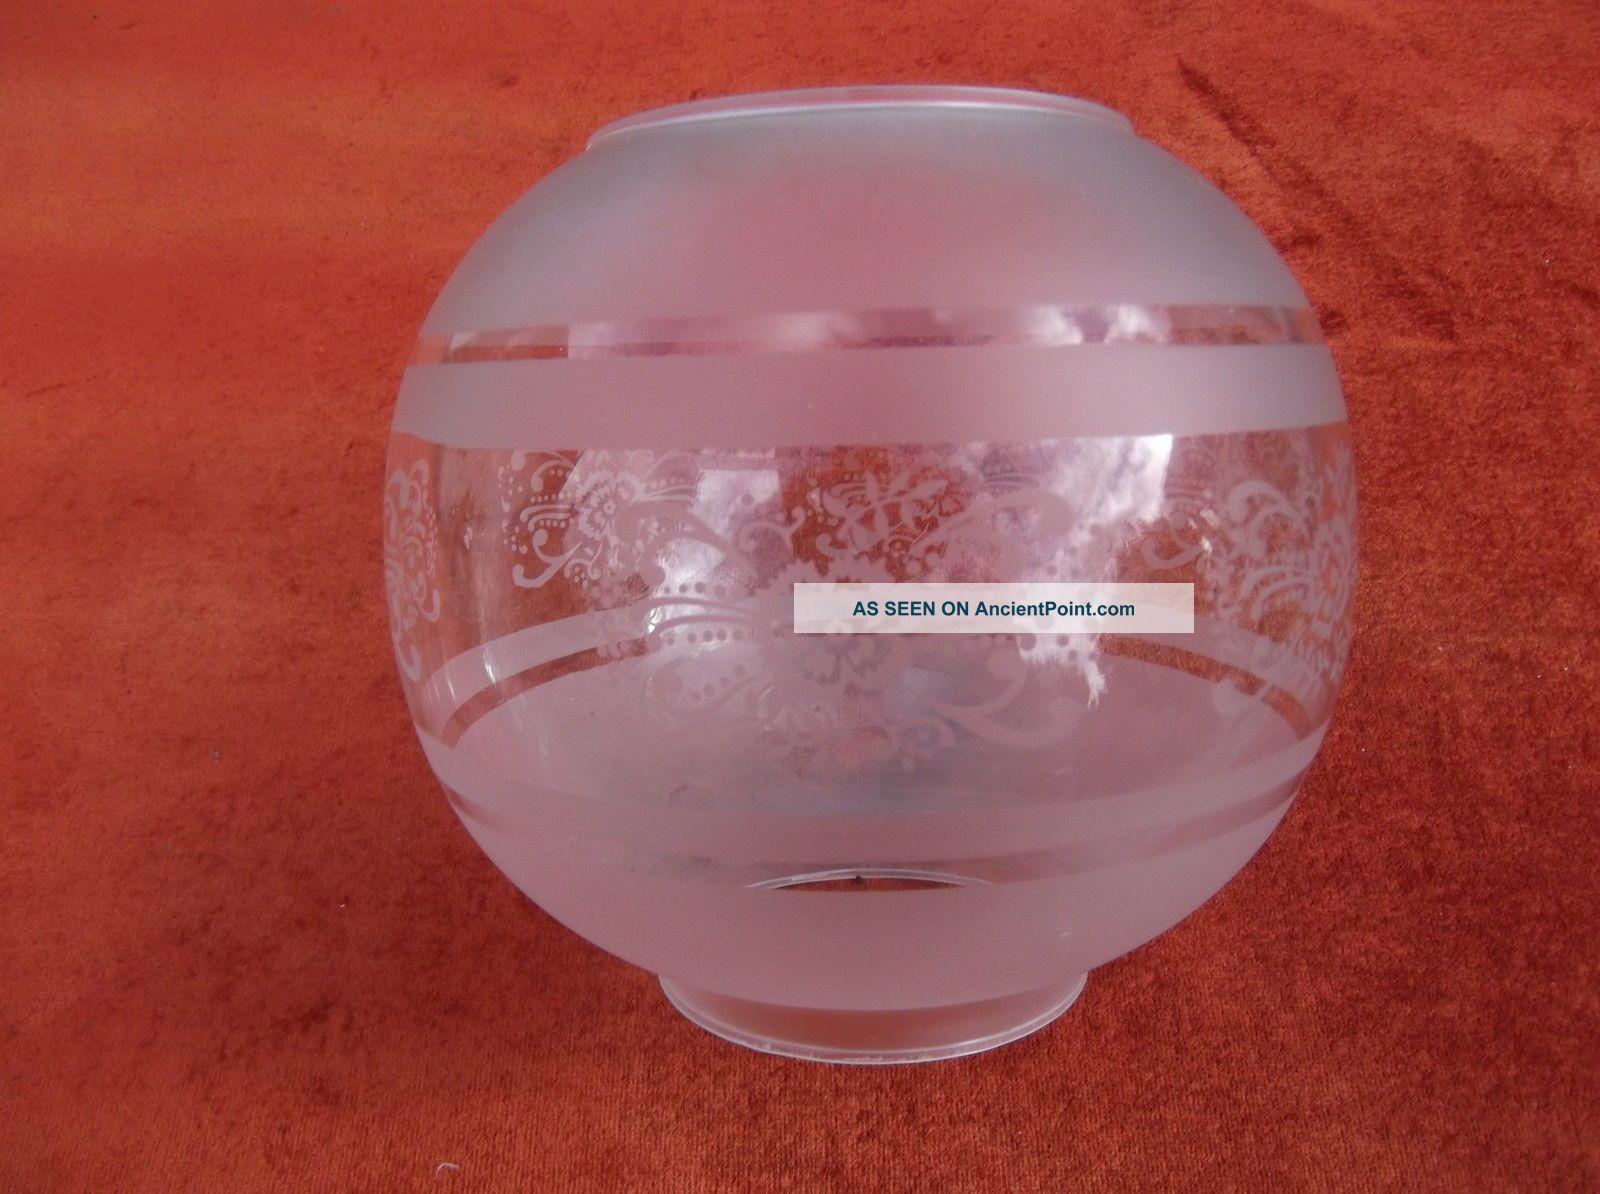 Vintage Oil Lamp Shade/duplex Twin Burner/paraffin Lantern/oil Burn Glass Shade 20th Century photo